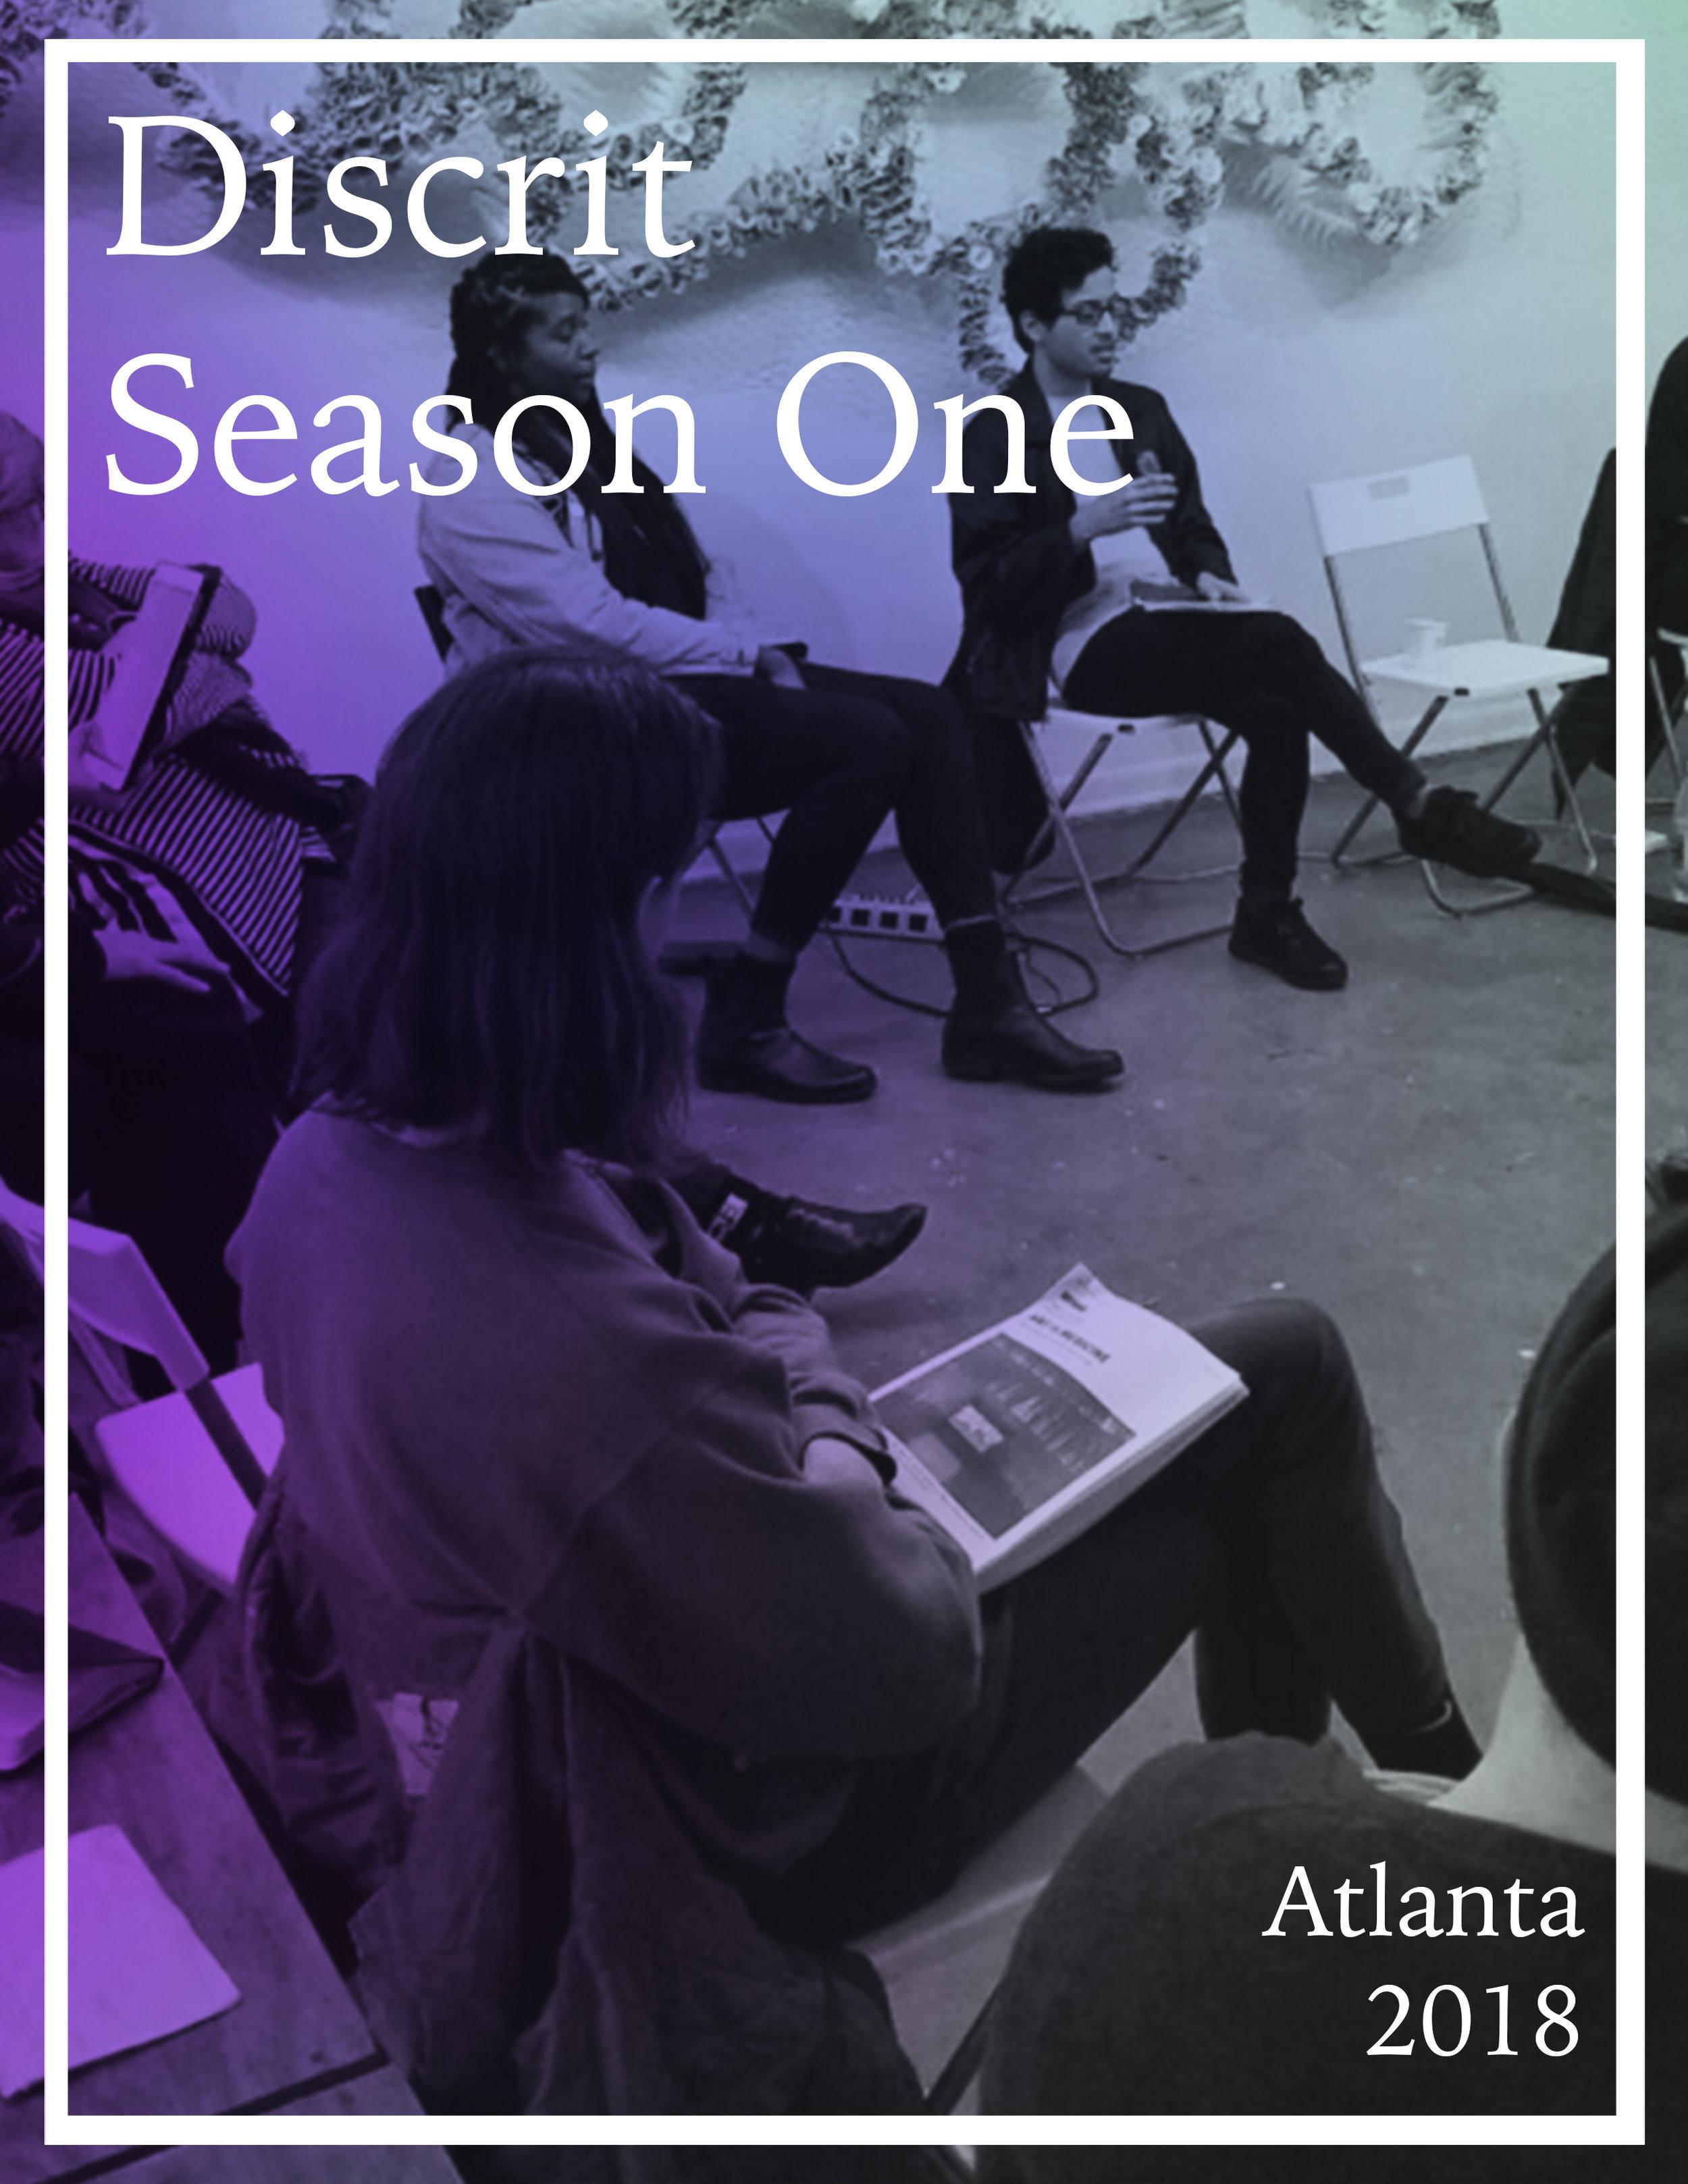 Discrit: Season One - Art Theory Discussion Group (Murmur Media, Atlanta, 2018)